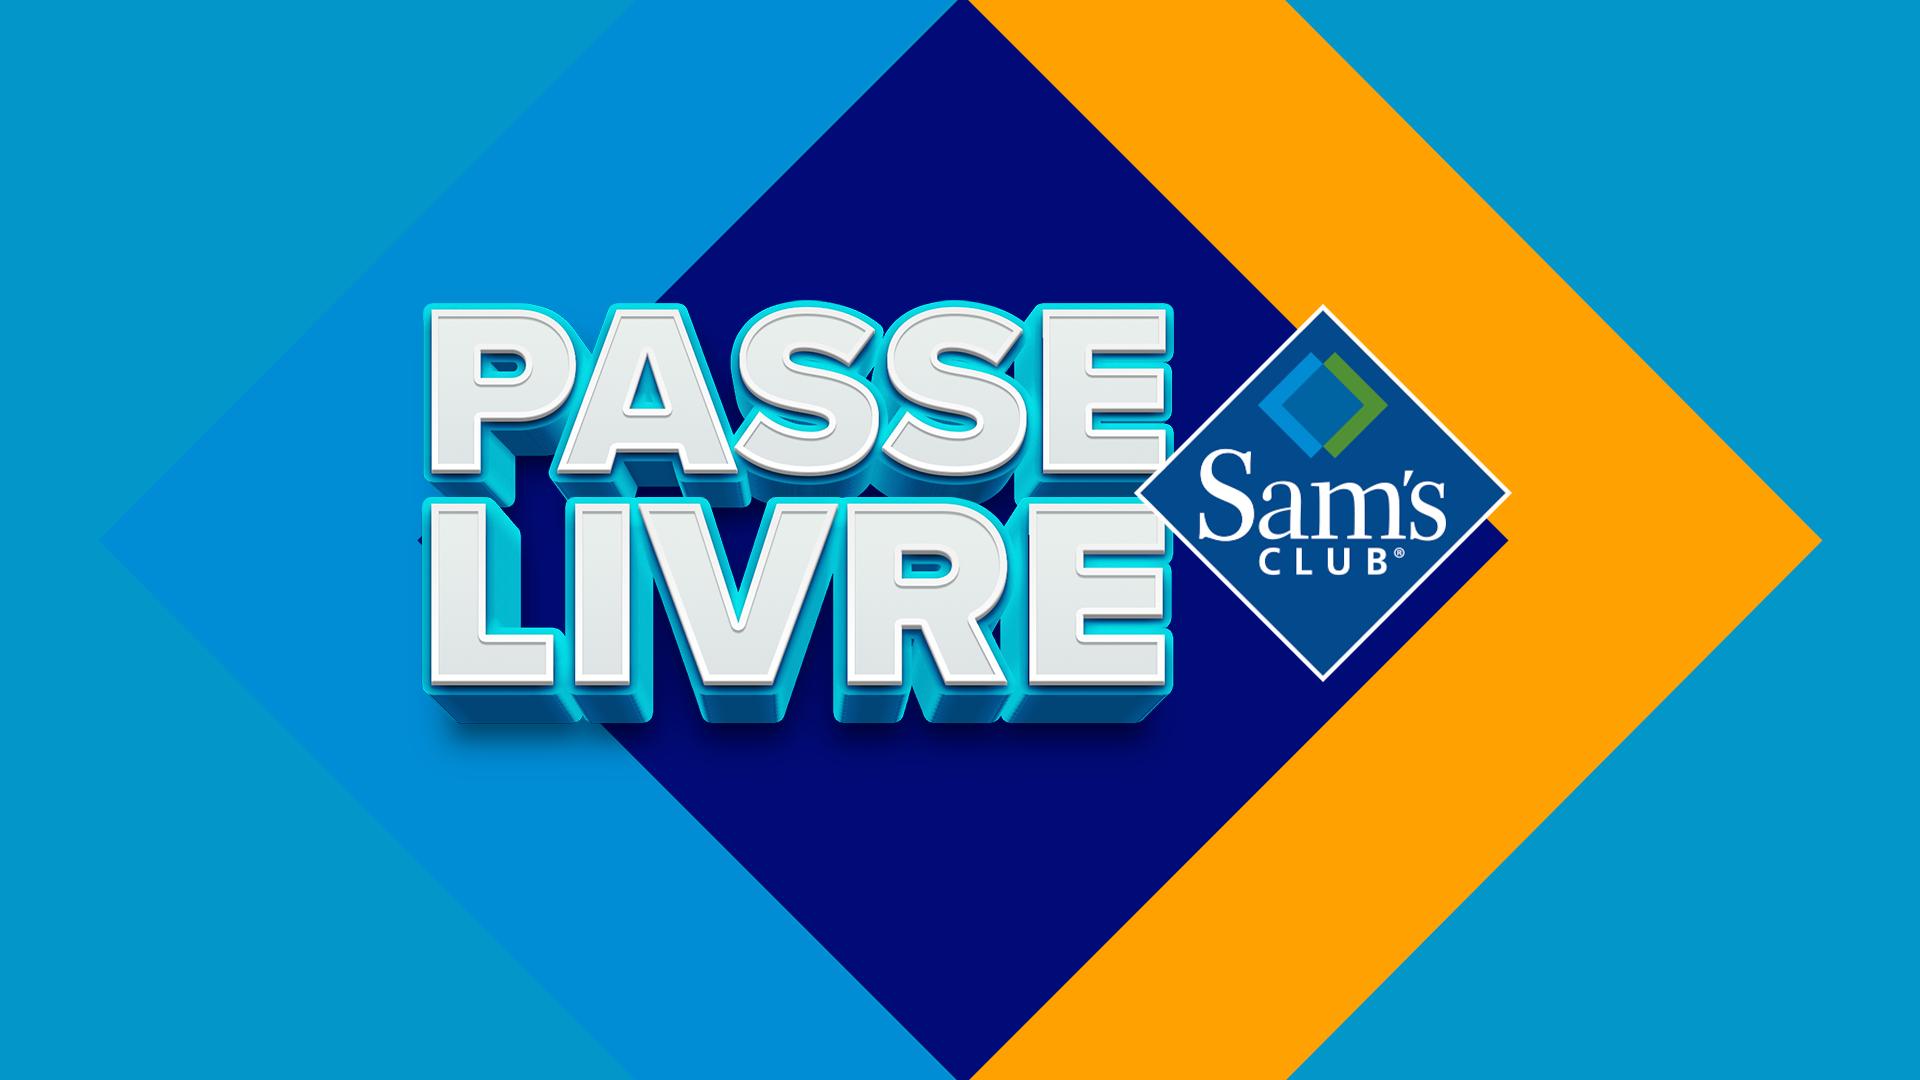 Passe Livre Sam's